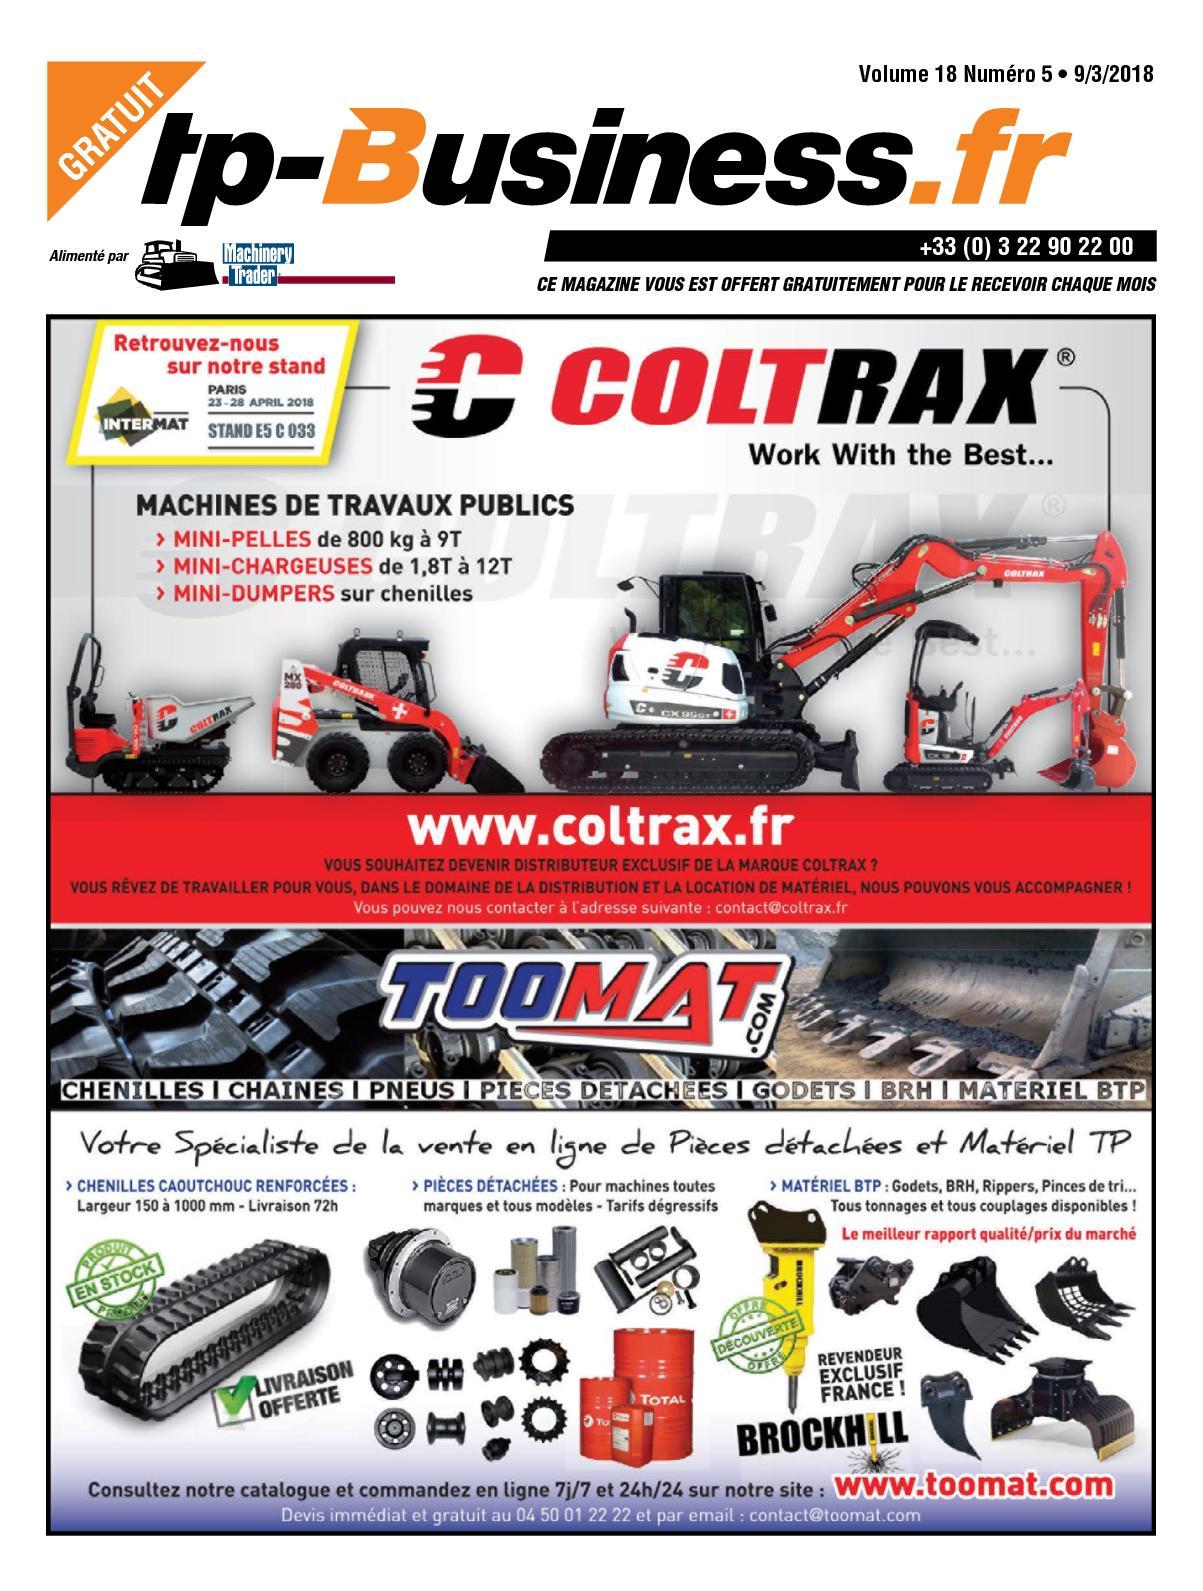 Calaméo - TP BUSINESS VOLUME 18 NUMÉRO 05 • 09/03/2018